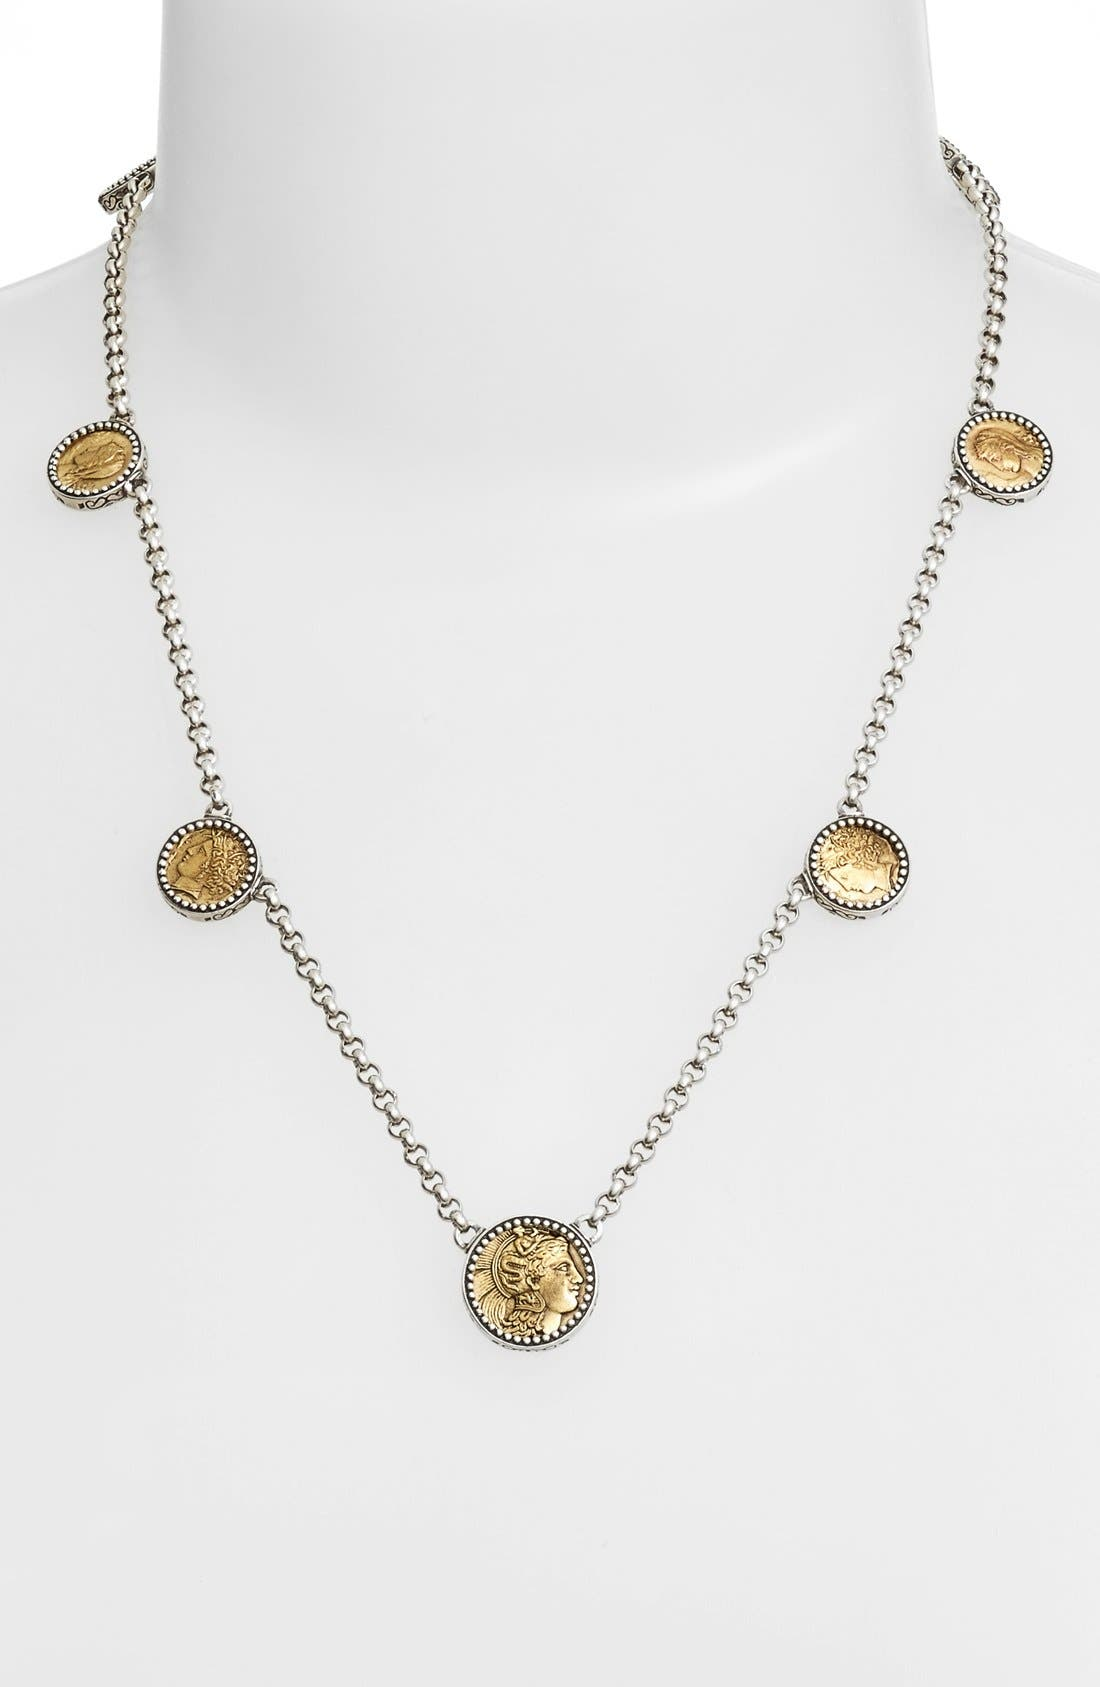 Konstantino 'Goddess' Coin Necklace